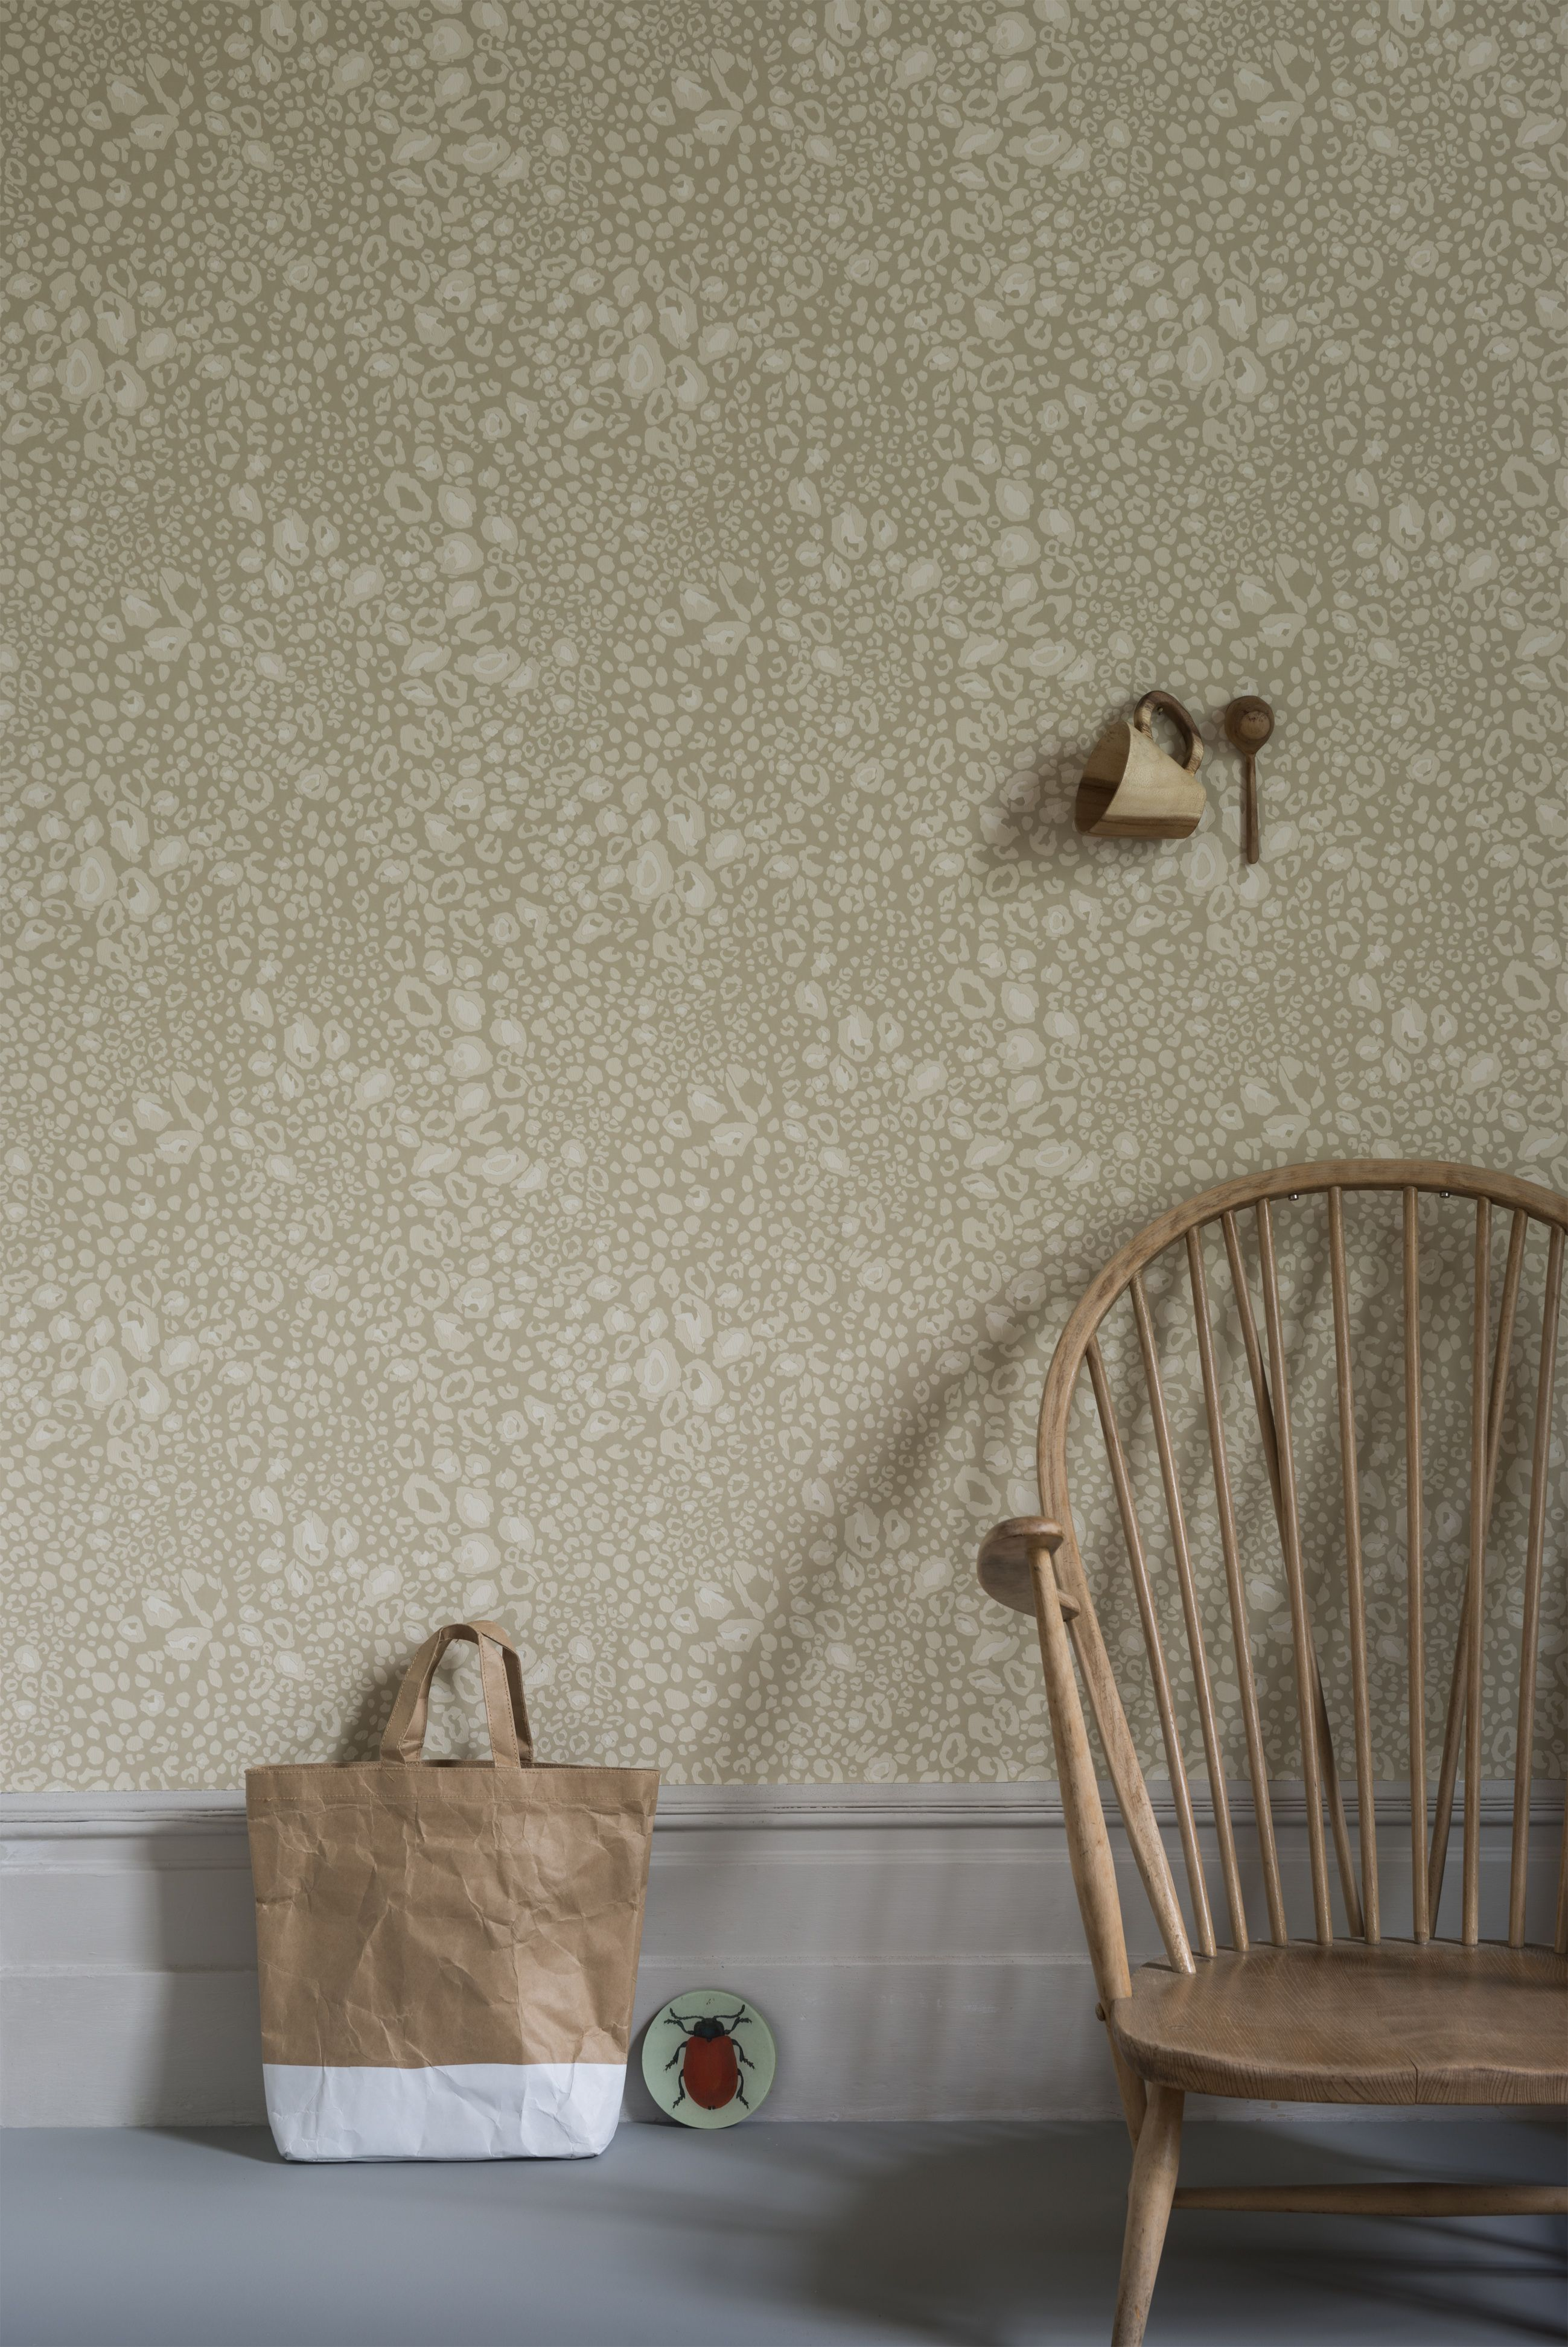 Ocelot Wallpaper Farrow Ball Farrow And Ball Paint Farrow Ball Home Wallpaper Farrow and ball wallpaper samples